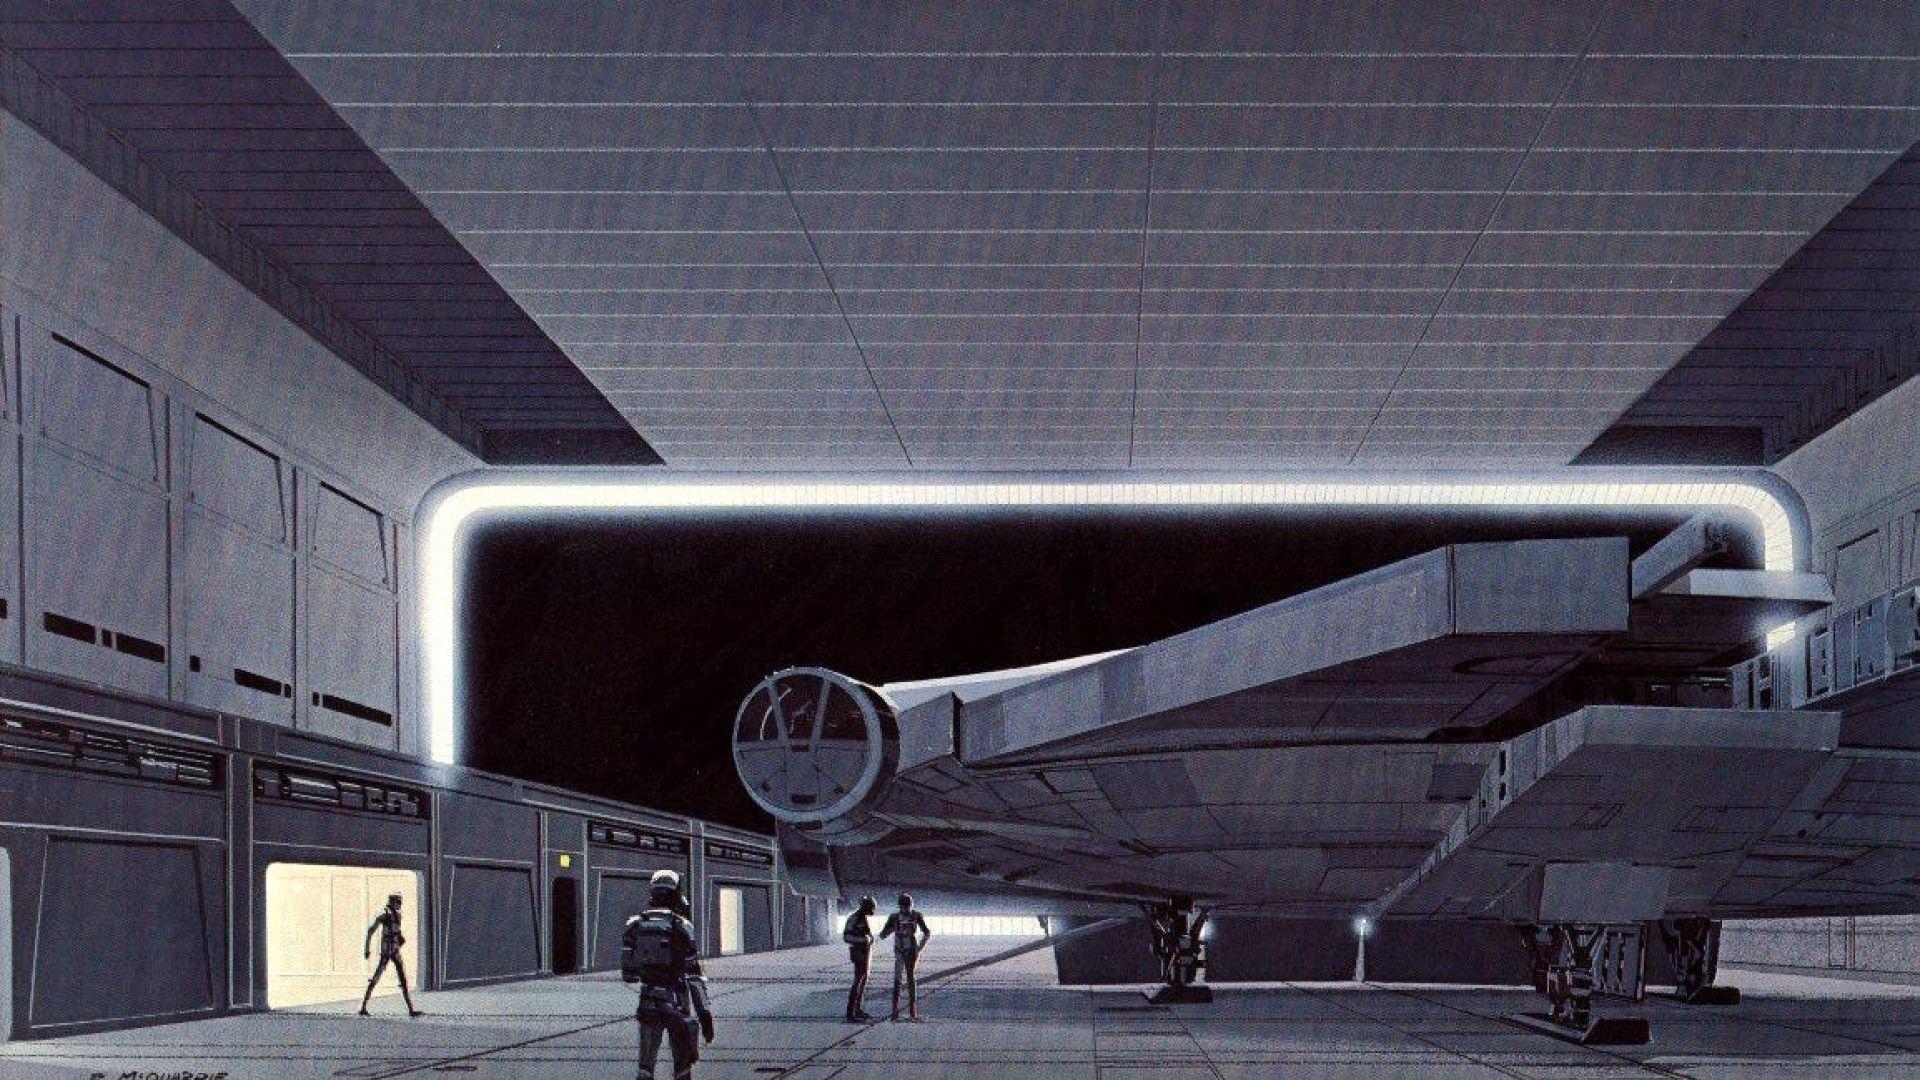 Science Fiction Artwork Ralph Mcquarrie Hangar Vi Wallpaper Star Wars Concept Art Star Wars Illustration Ralph Mcquarrie